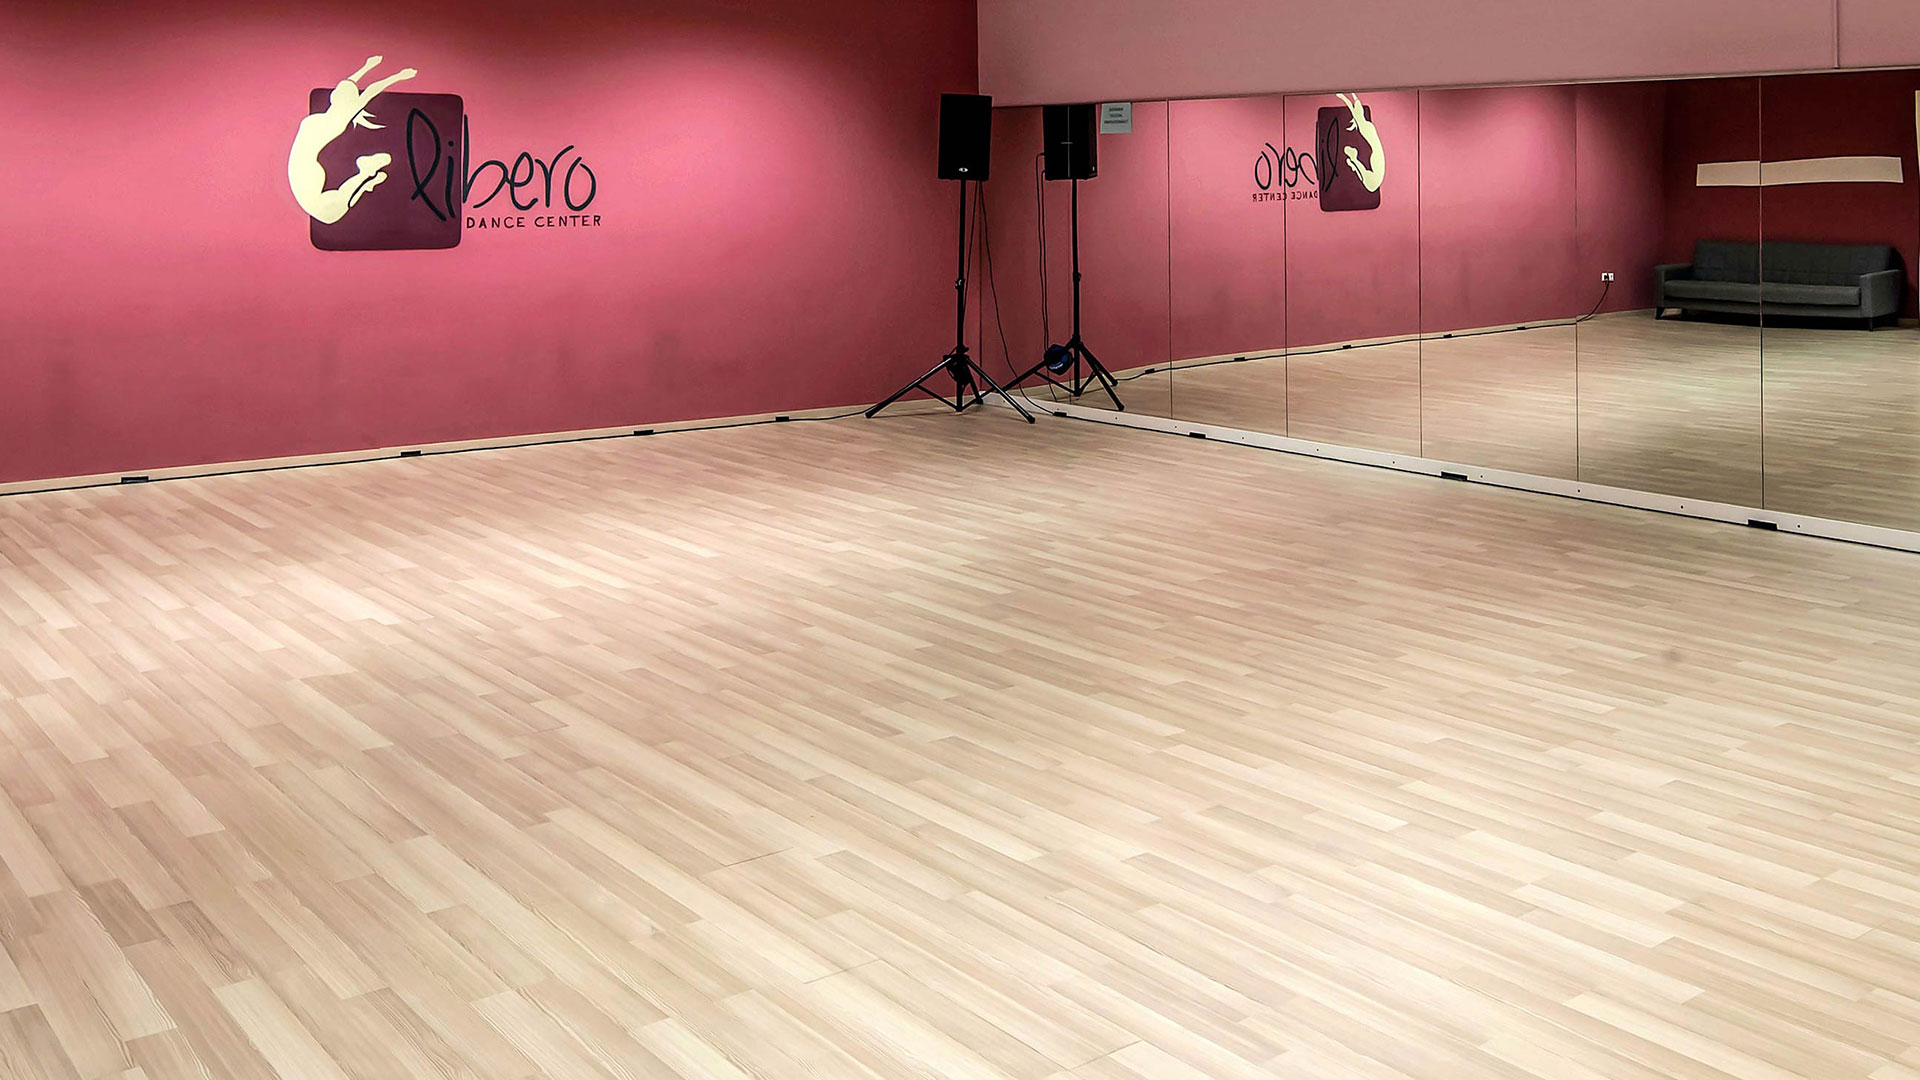 Libero Dance Center